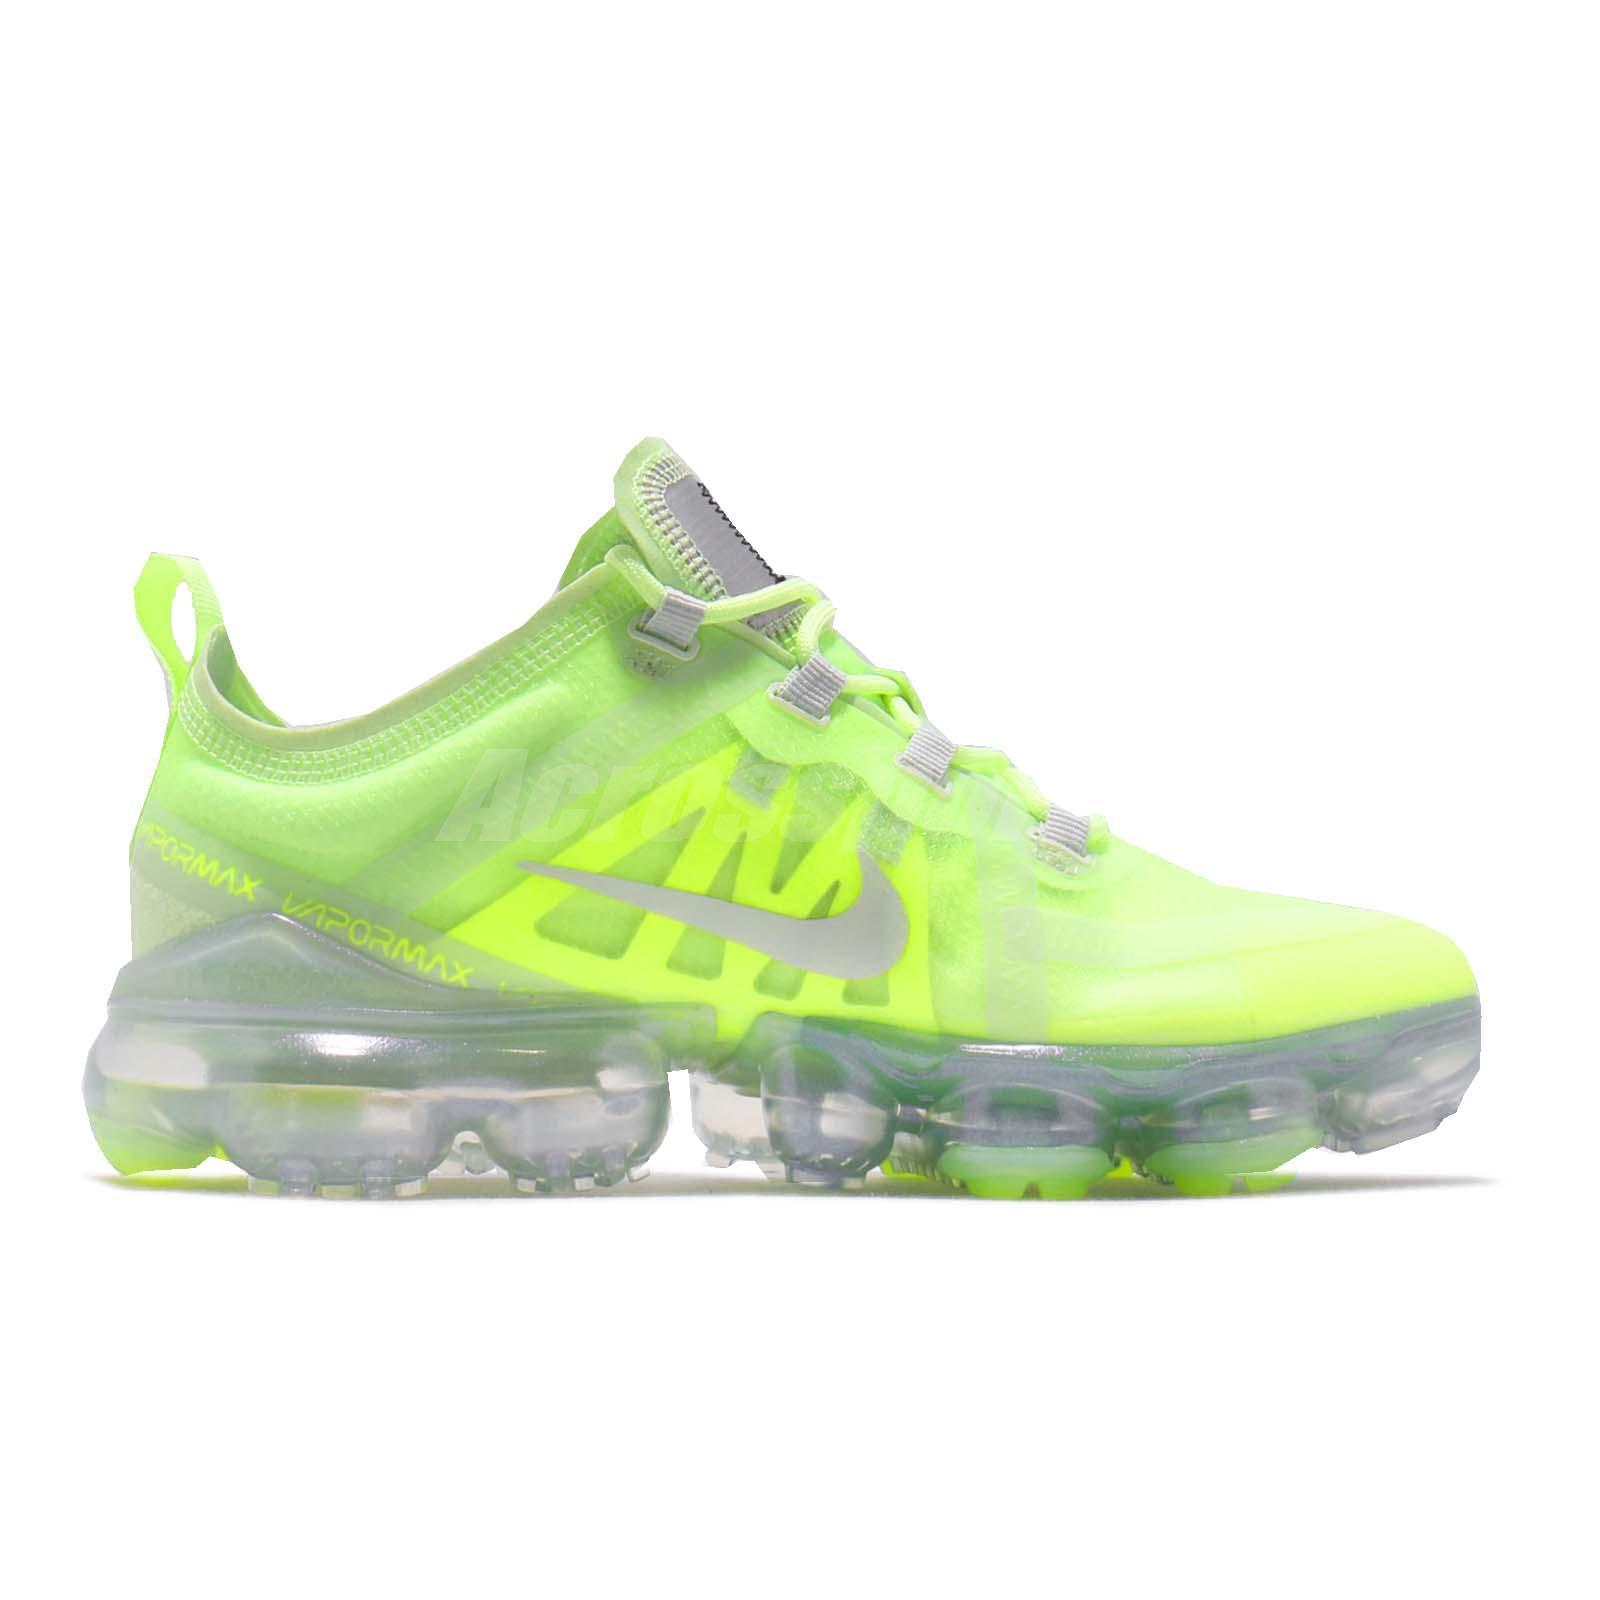 new style 8115c a9bd9 Details about Nike Wmns Air Vapormax 2019 Volt Glow Spruce Aura Women  Running Shoes AR6632-700